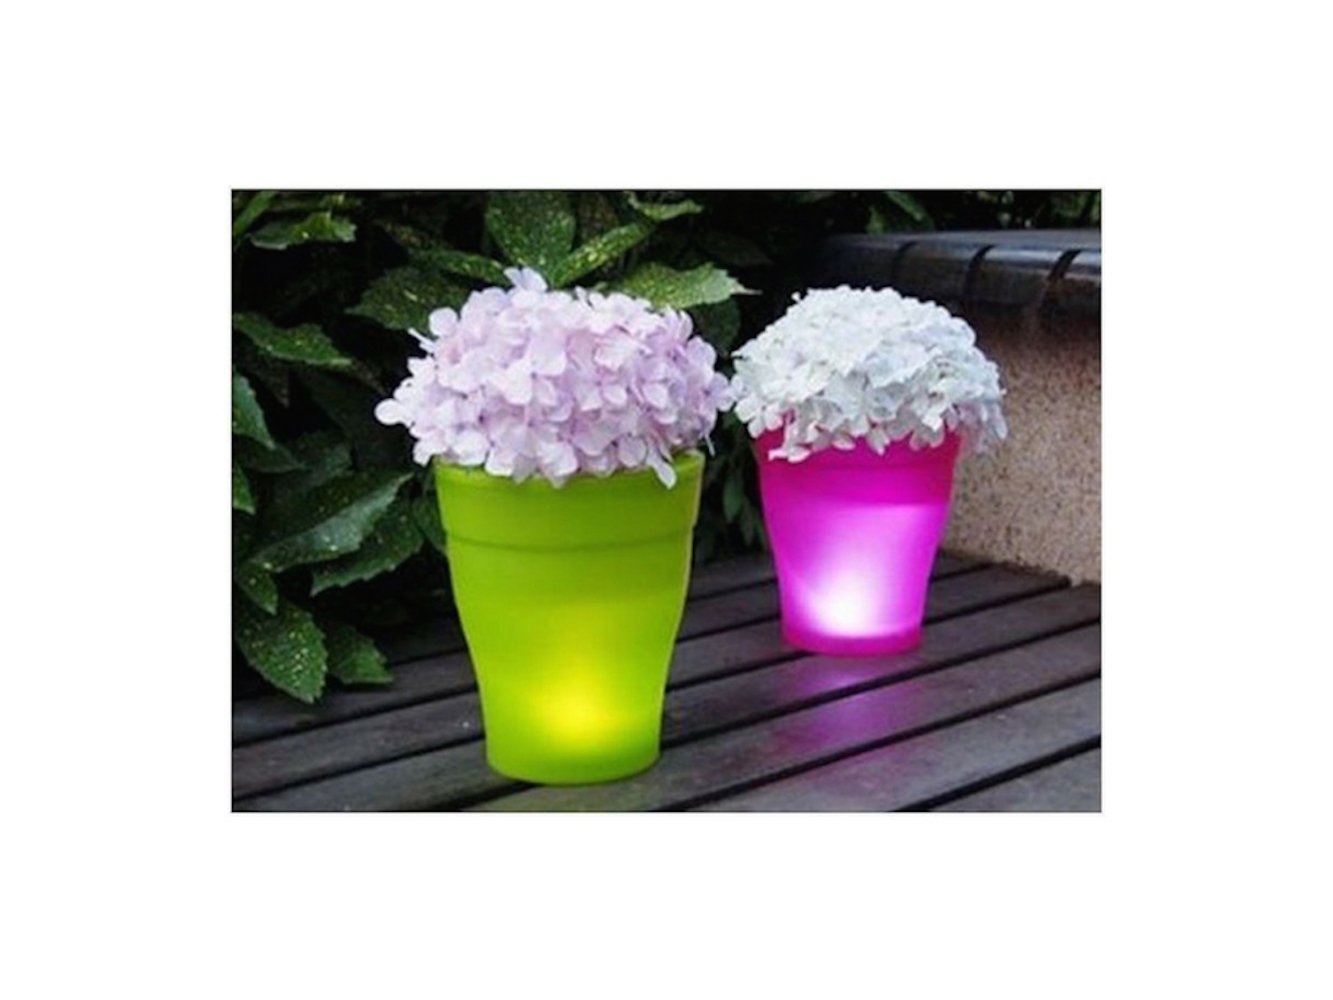 SALE Solar Illuminated Planter (Pink) Led Lighted Solar Flower Pot Lamp Urn Decorative Garden Led Plant Pot Modern Planter Vase